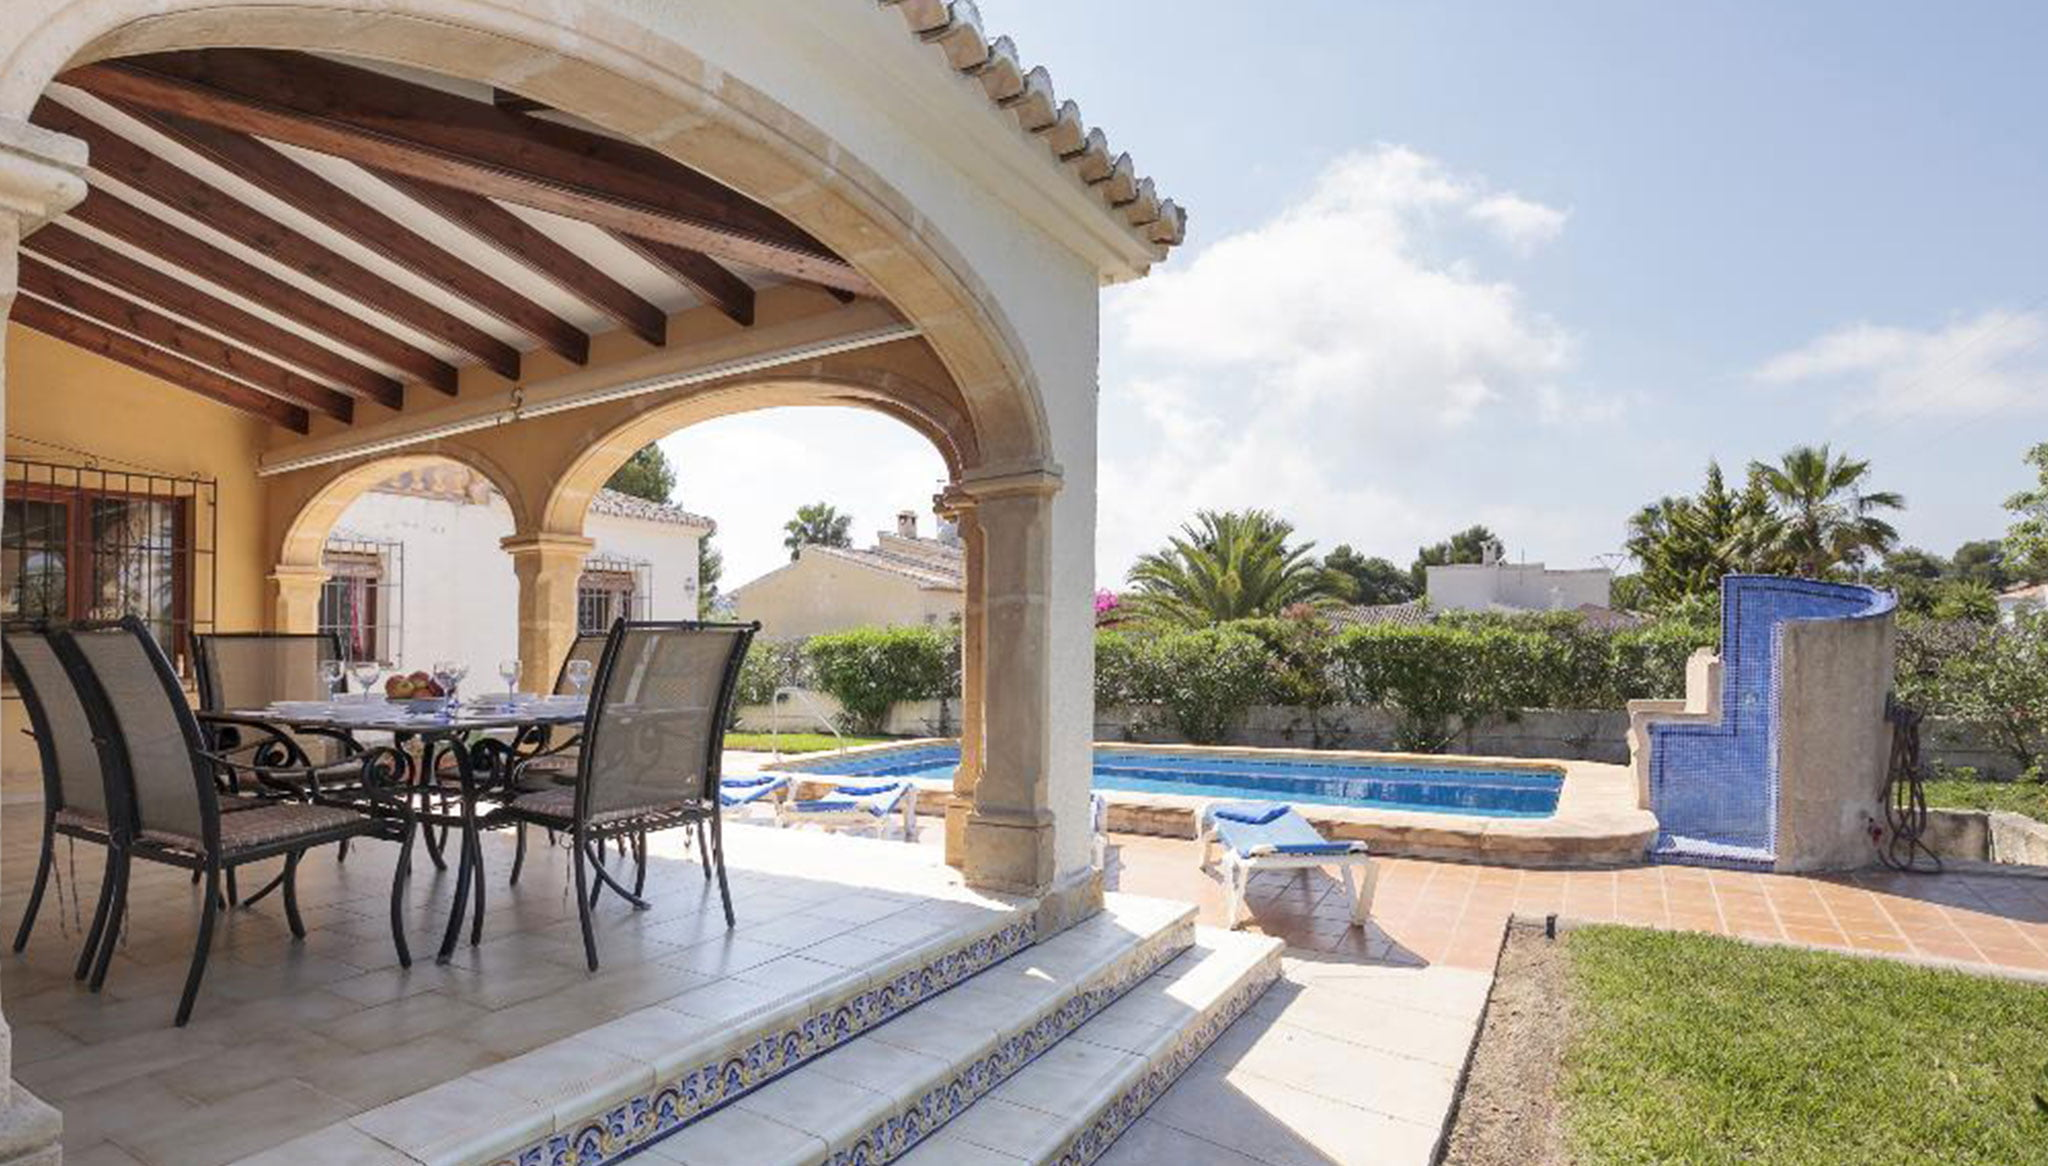 Terraza cubierta en un chalet en Jávea – Quality Rent a Villa